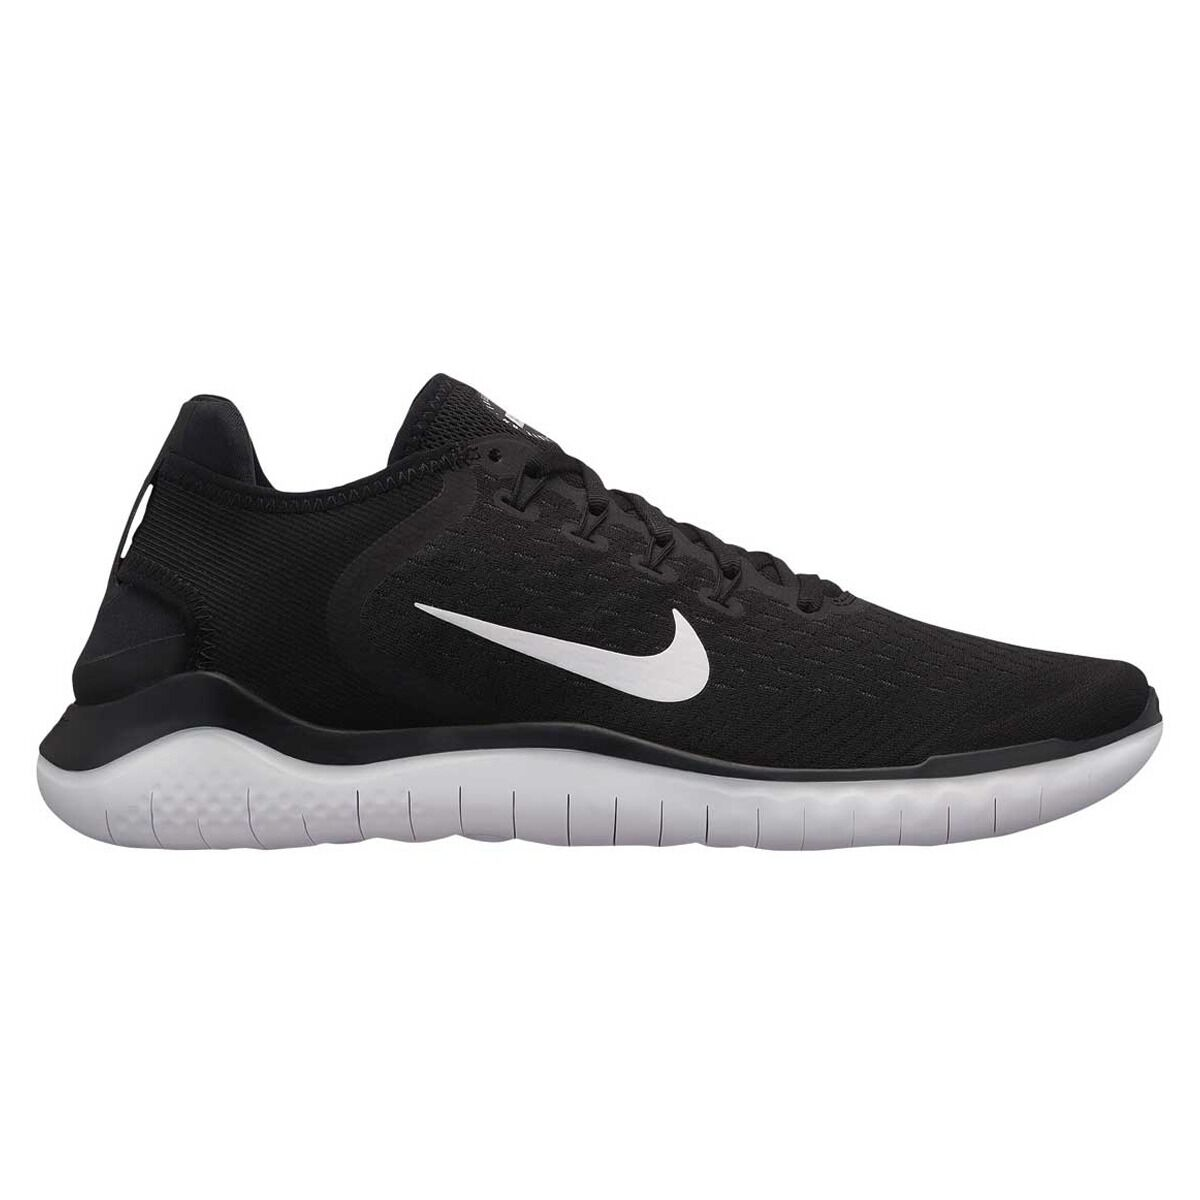 Nike Free RN 2018 Mens Running Shoes